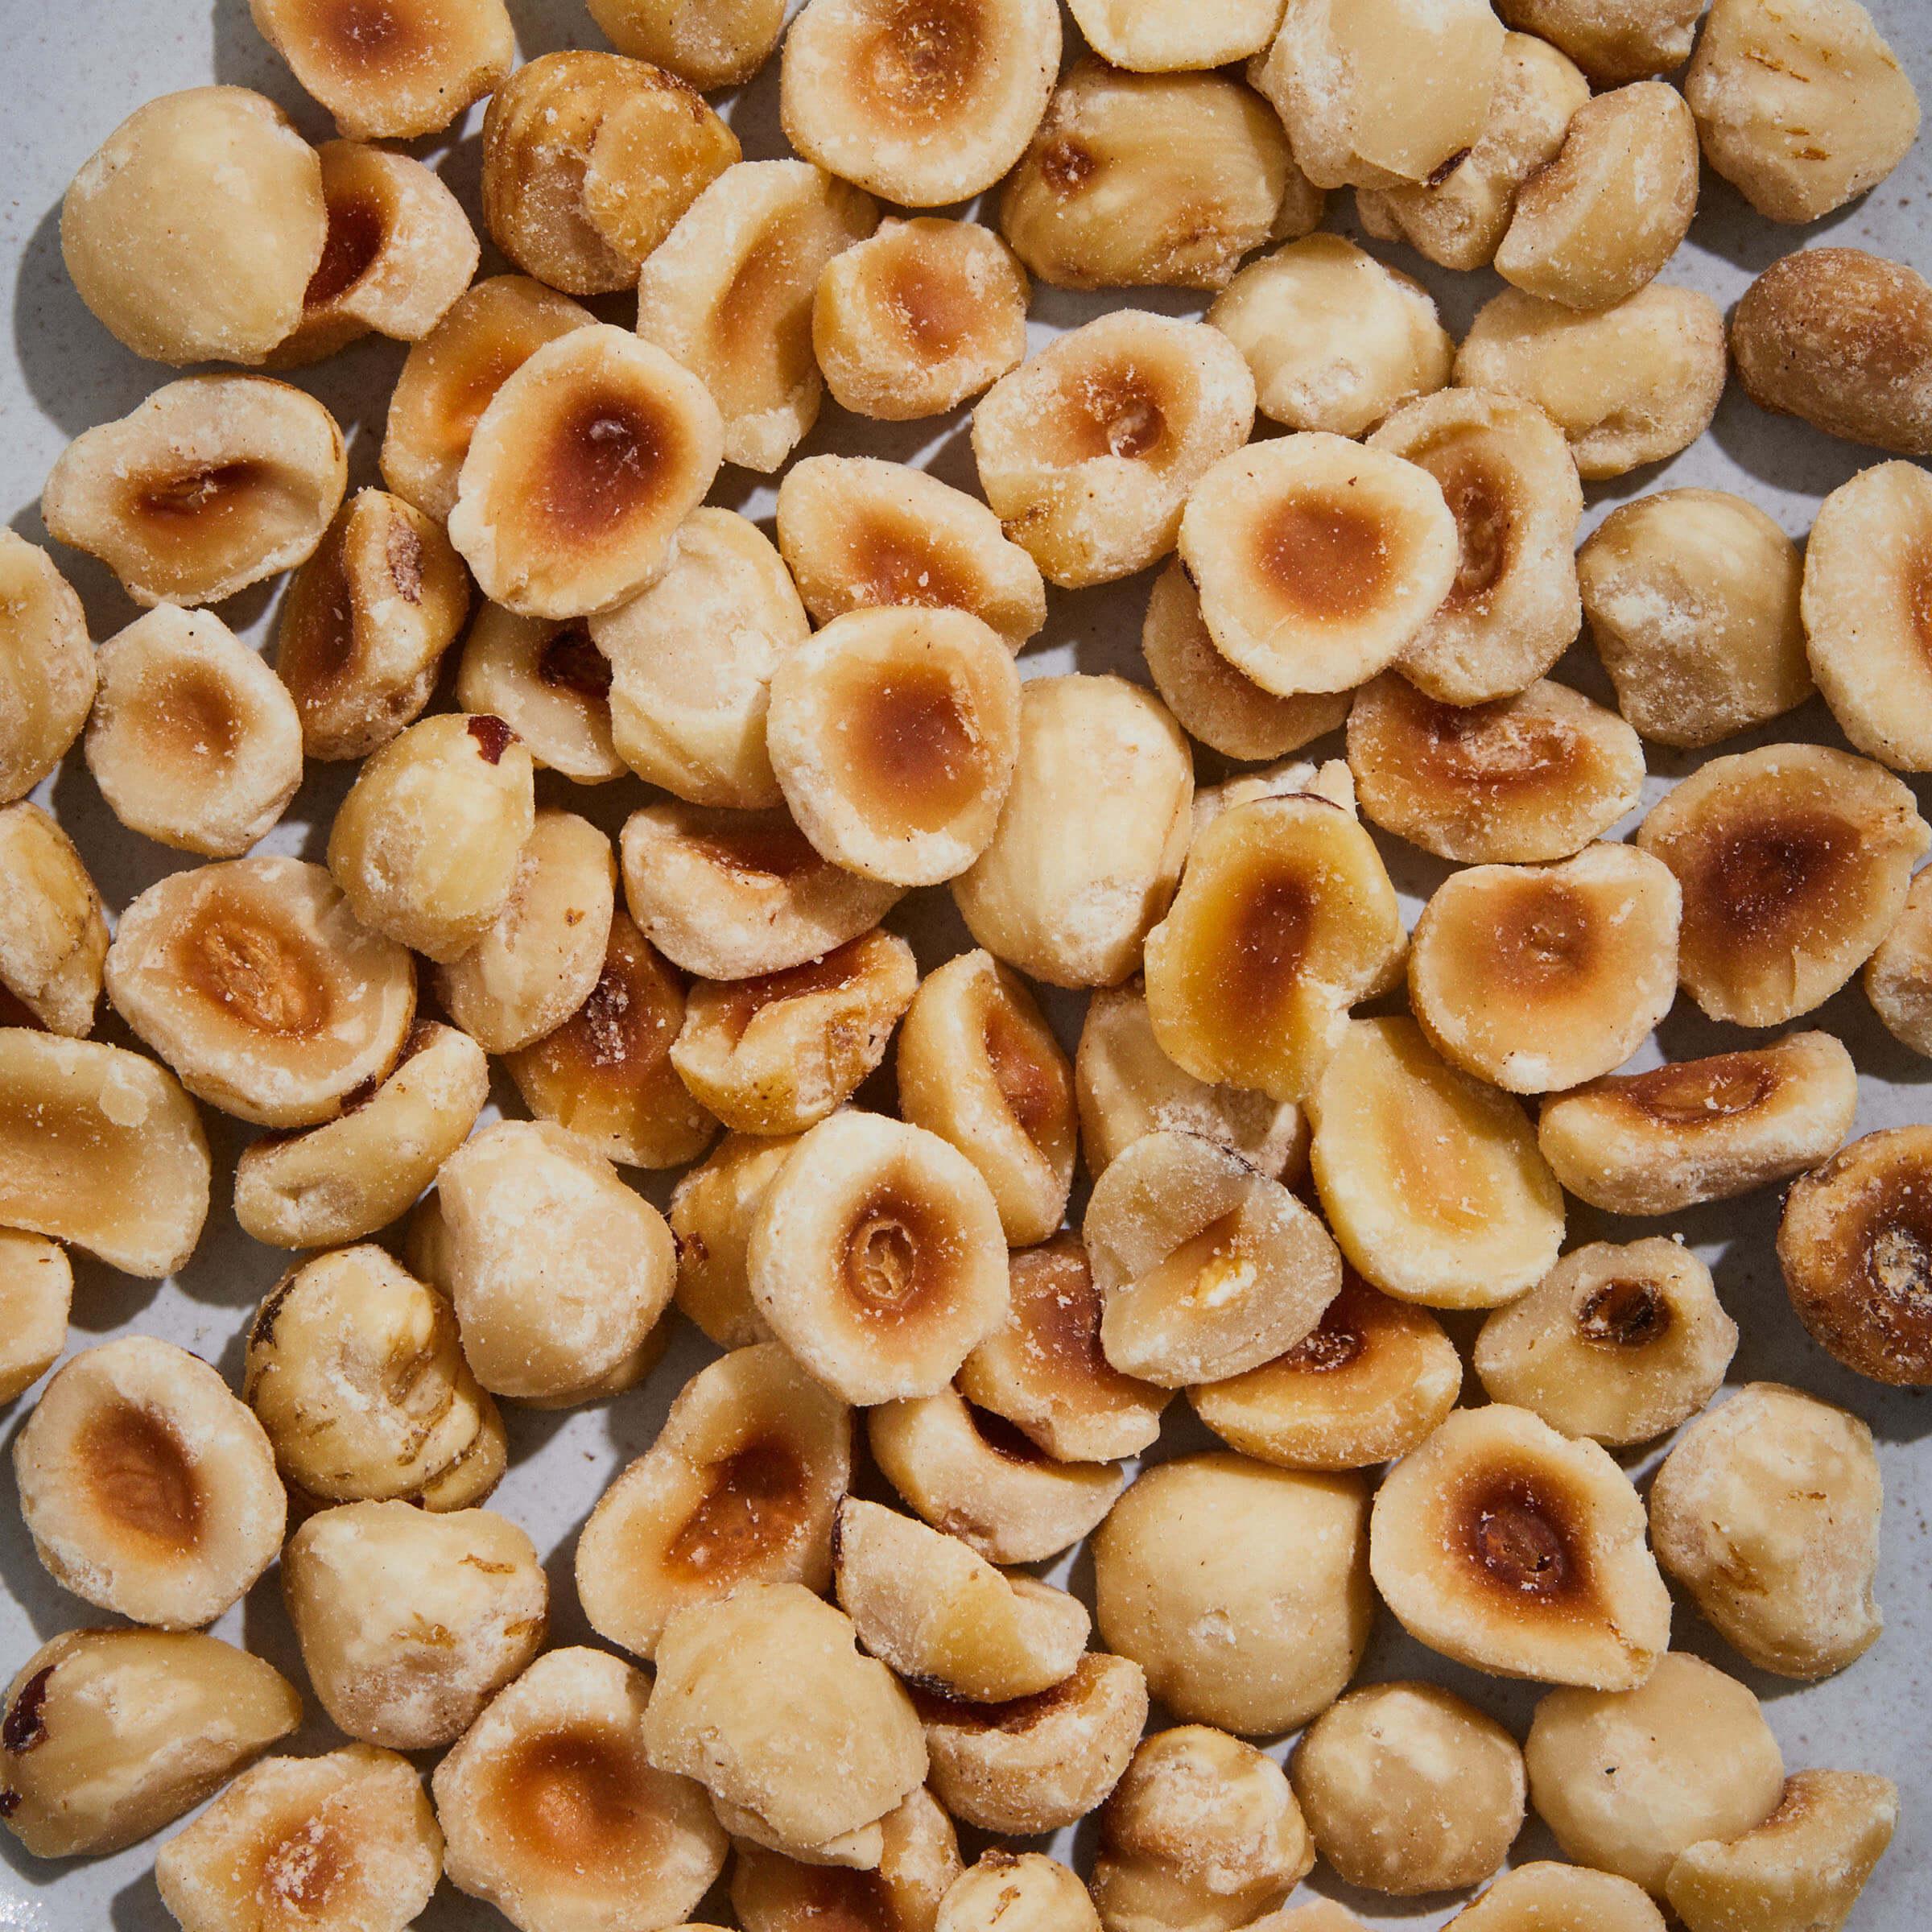 Hasselnötter rostad 7-11 mm